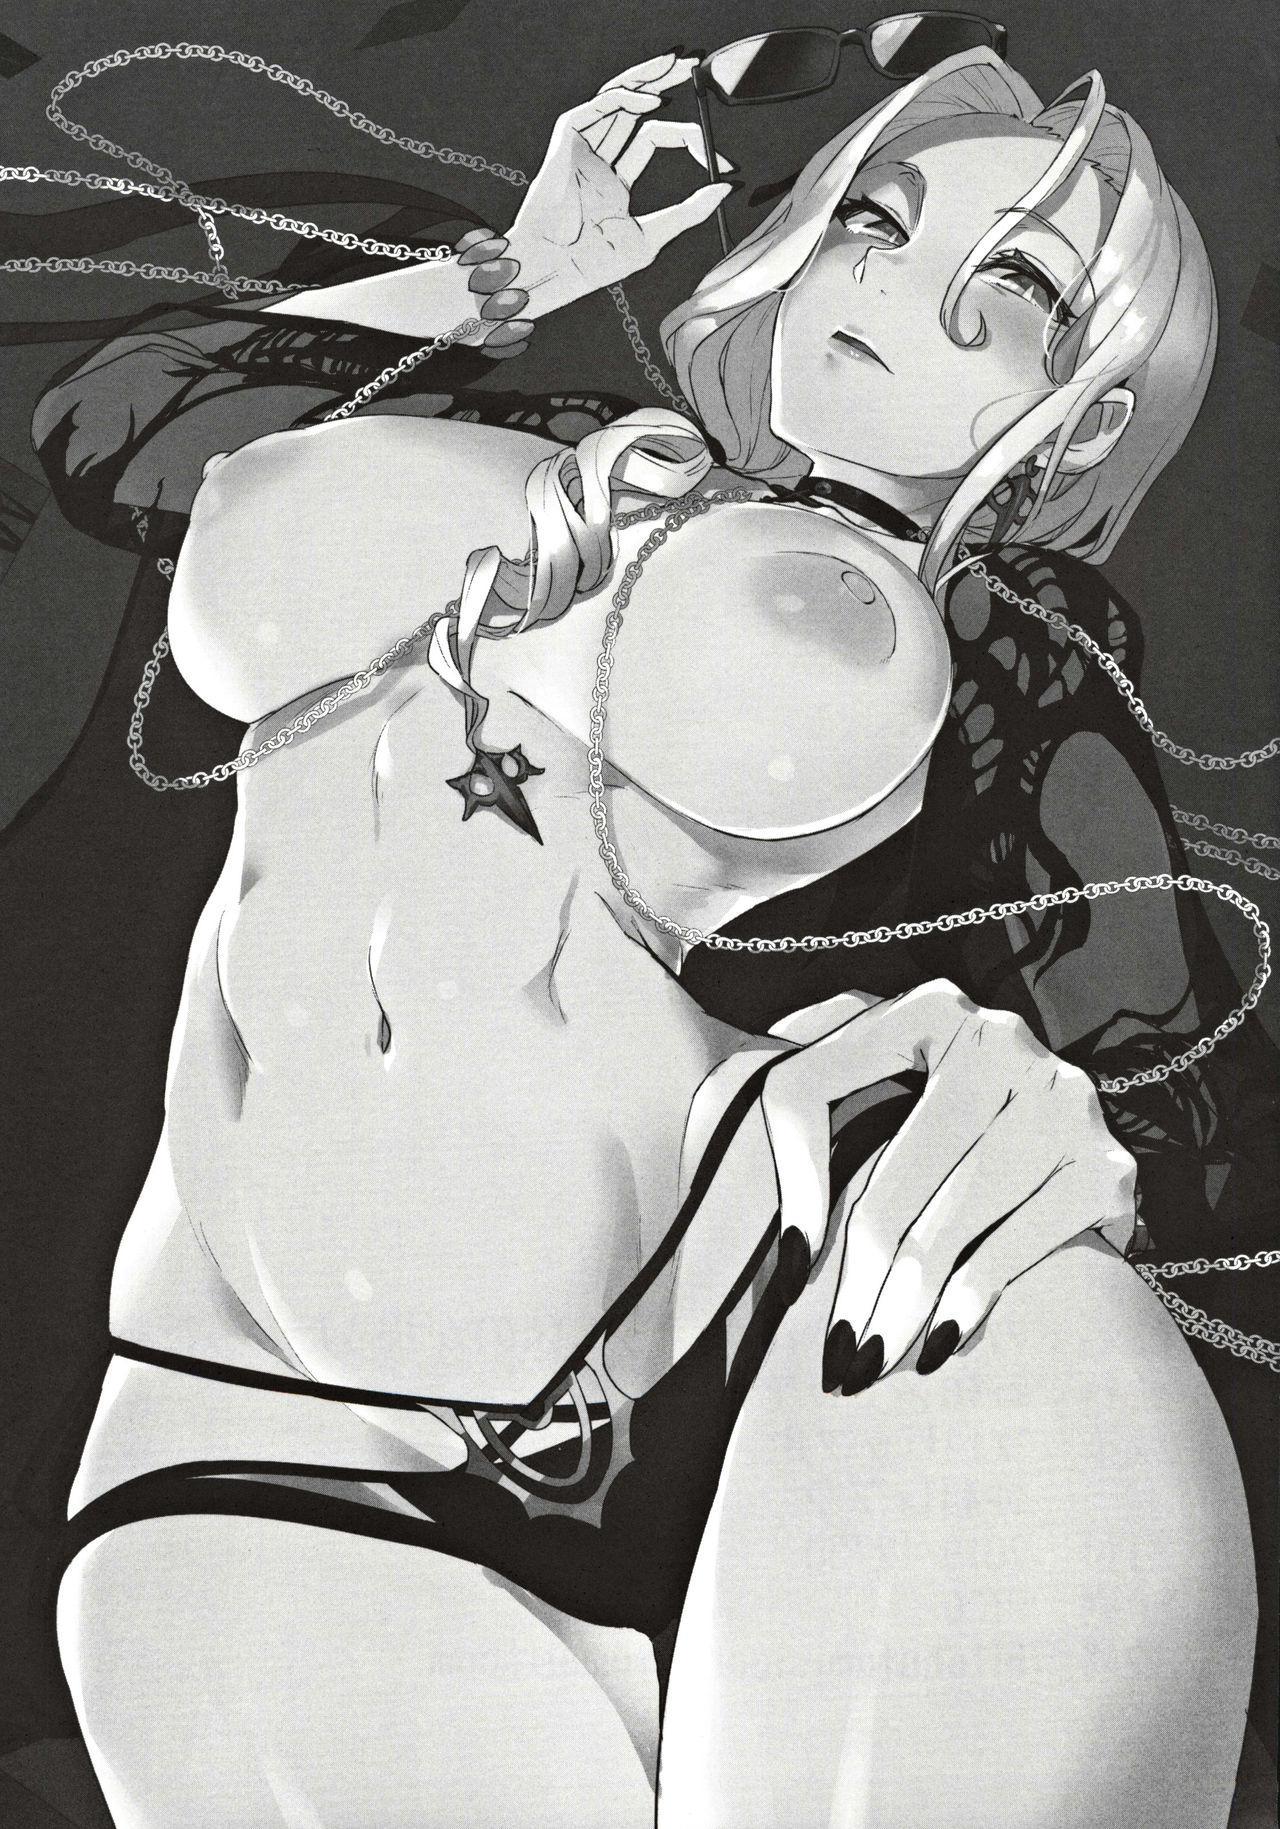 Carmilla-san no Ecchi na no ga Kakitakatta Hon | I Wanted To Draw A Book About Carmilla's Sexiness 27